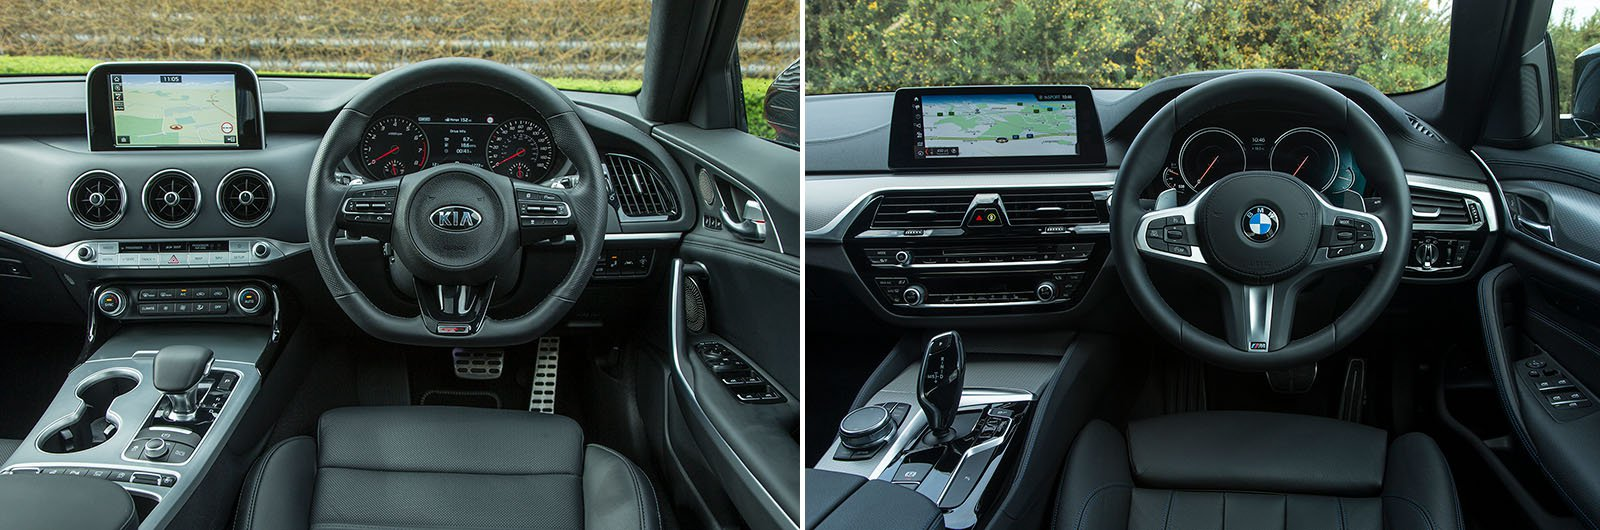 New Kia Stinger vs used BMW 5 Series – interior & equipment